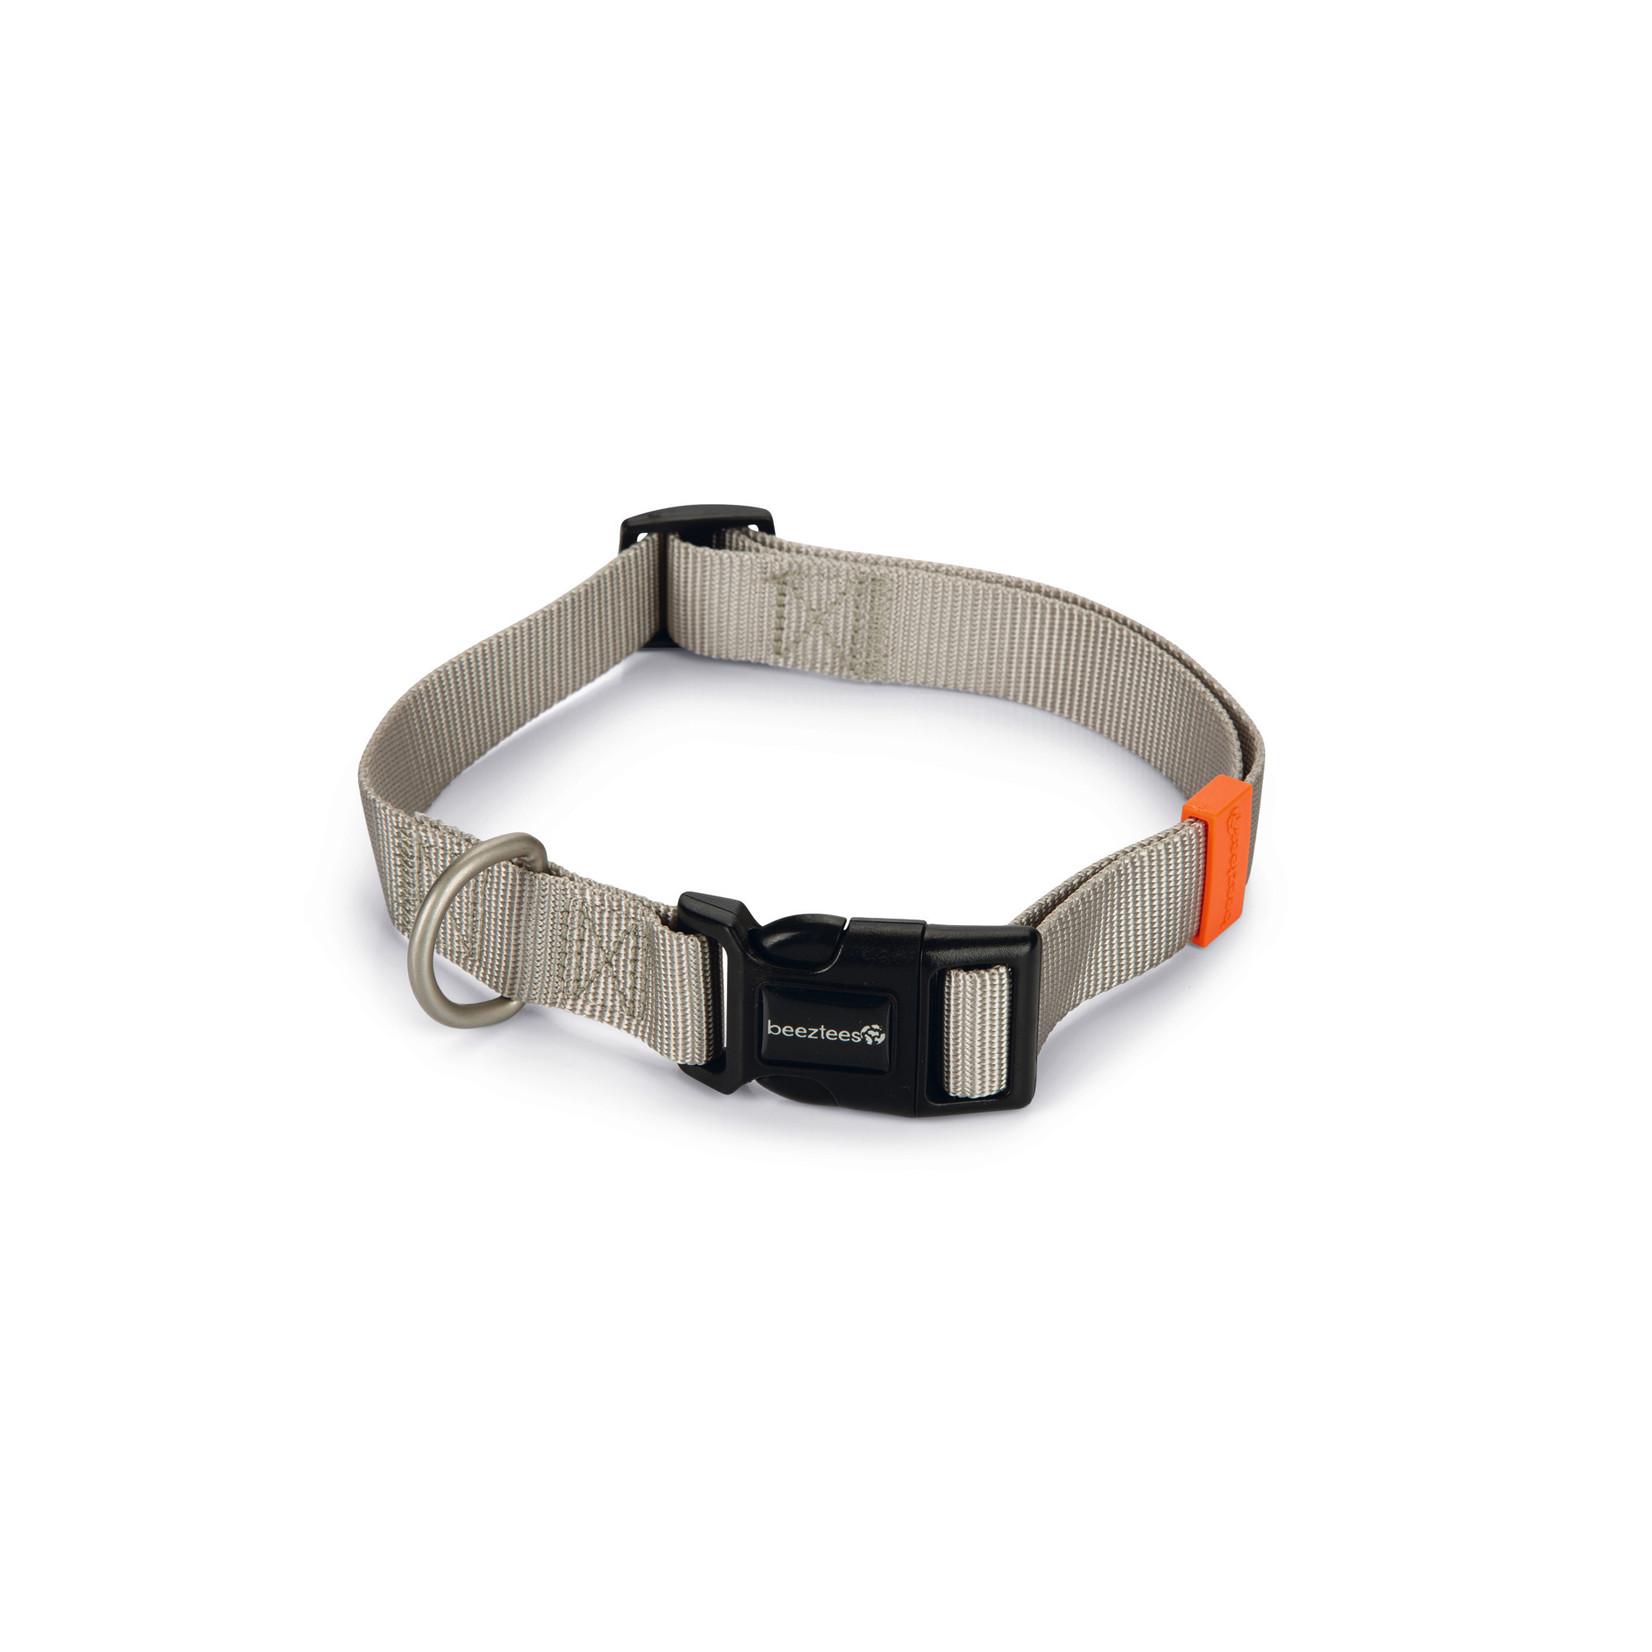 Beeztees BZ Nylon Halsband Uni  Lichtgrijs